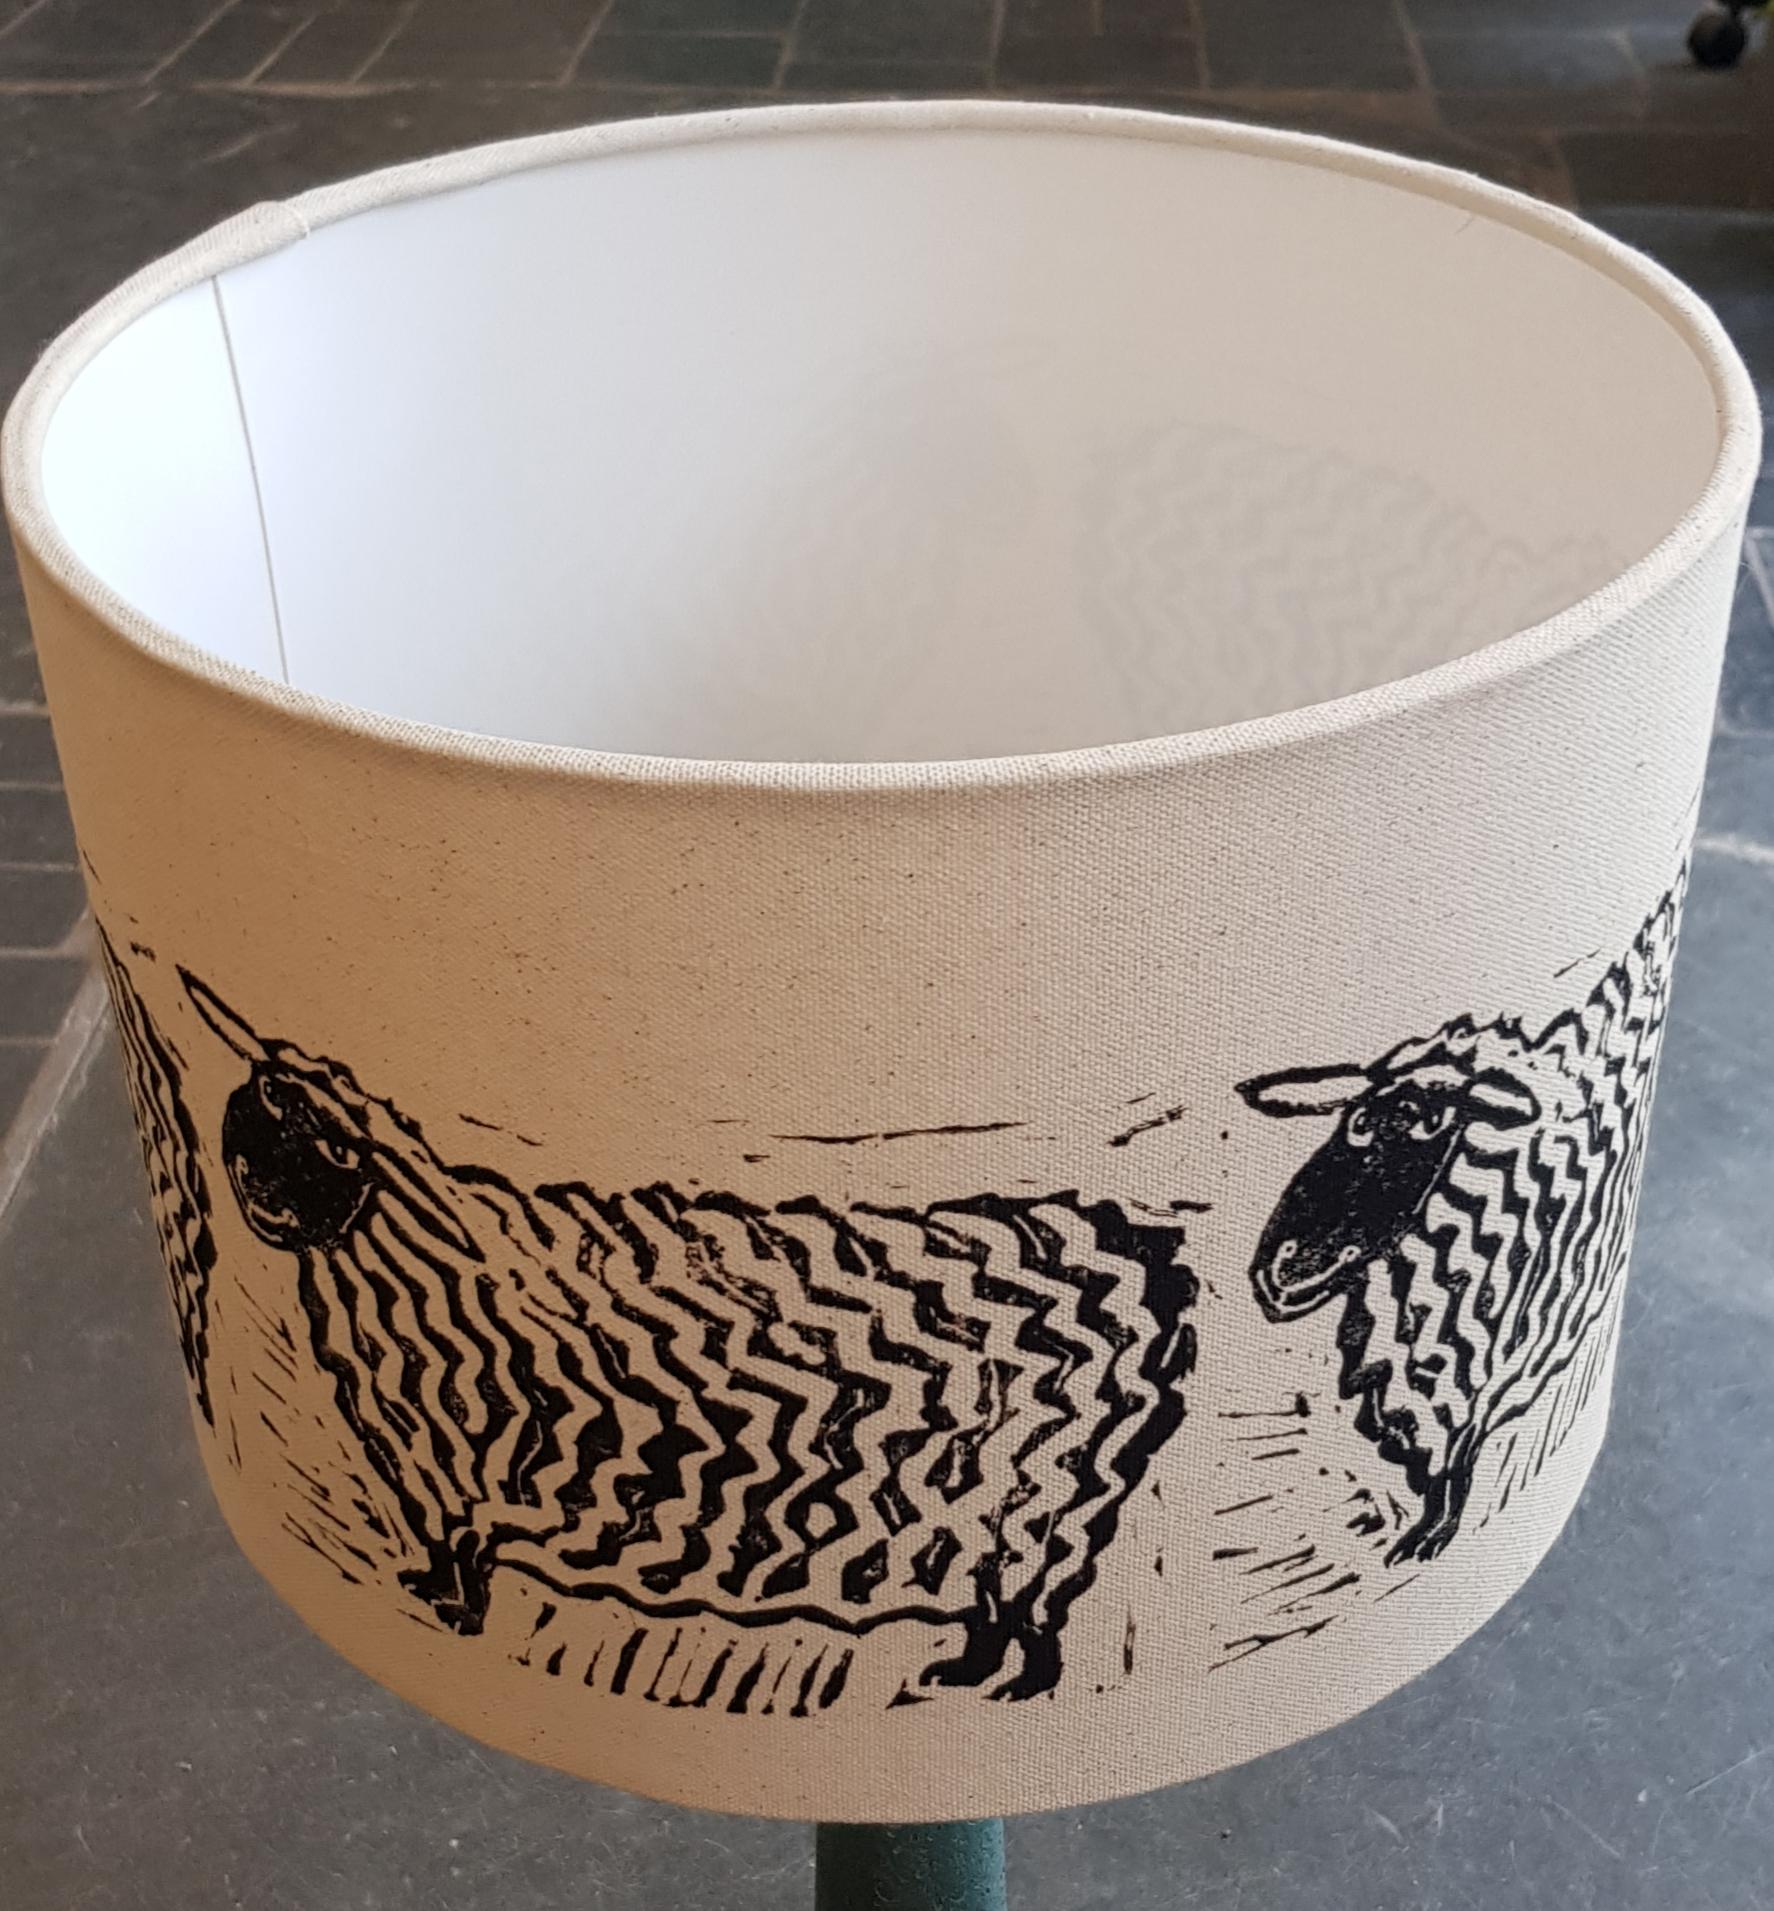 Handmade lampshade 30 cm sheep design jane adams ceramics table lamp shade shade lampshade lampshades handmade lampshades handmade shades aloadofball Choice Image